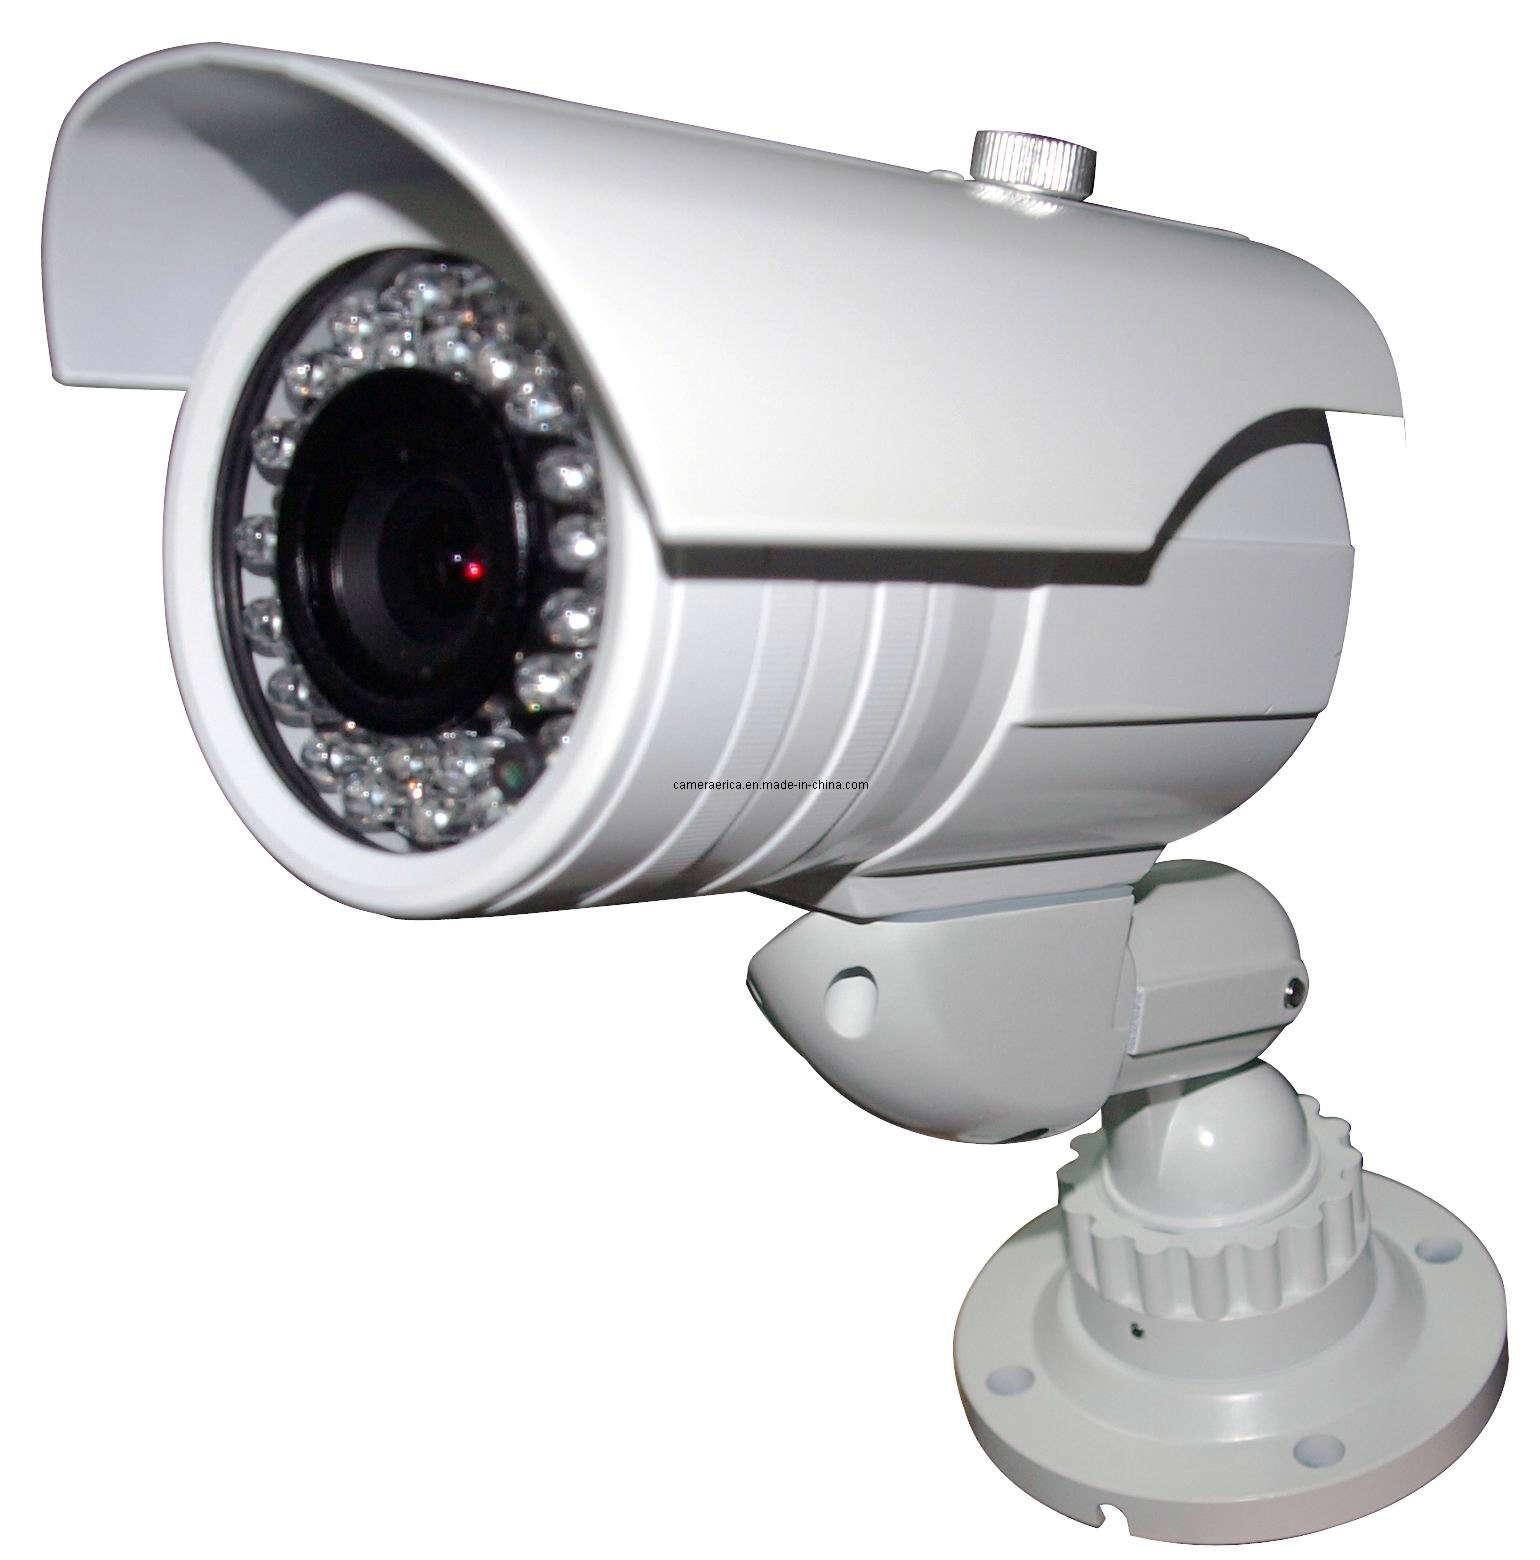 Best Home Video Surveillance Systems